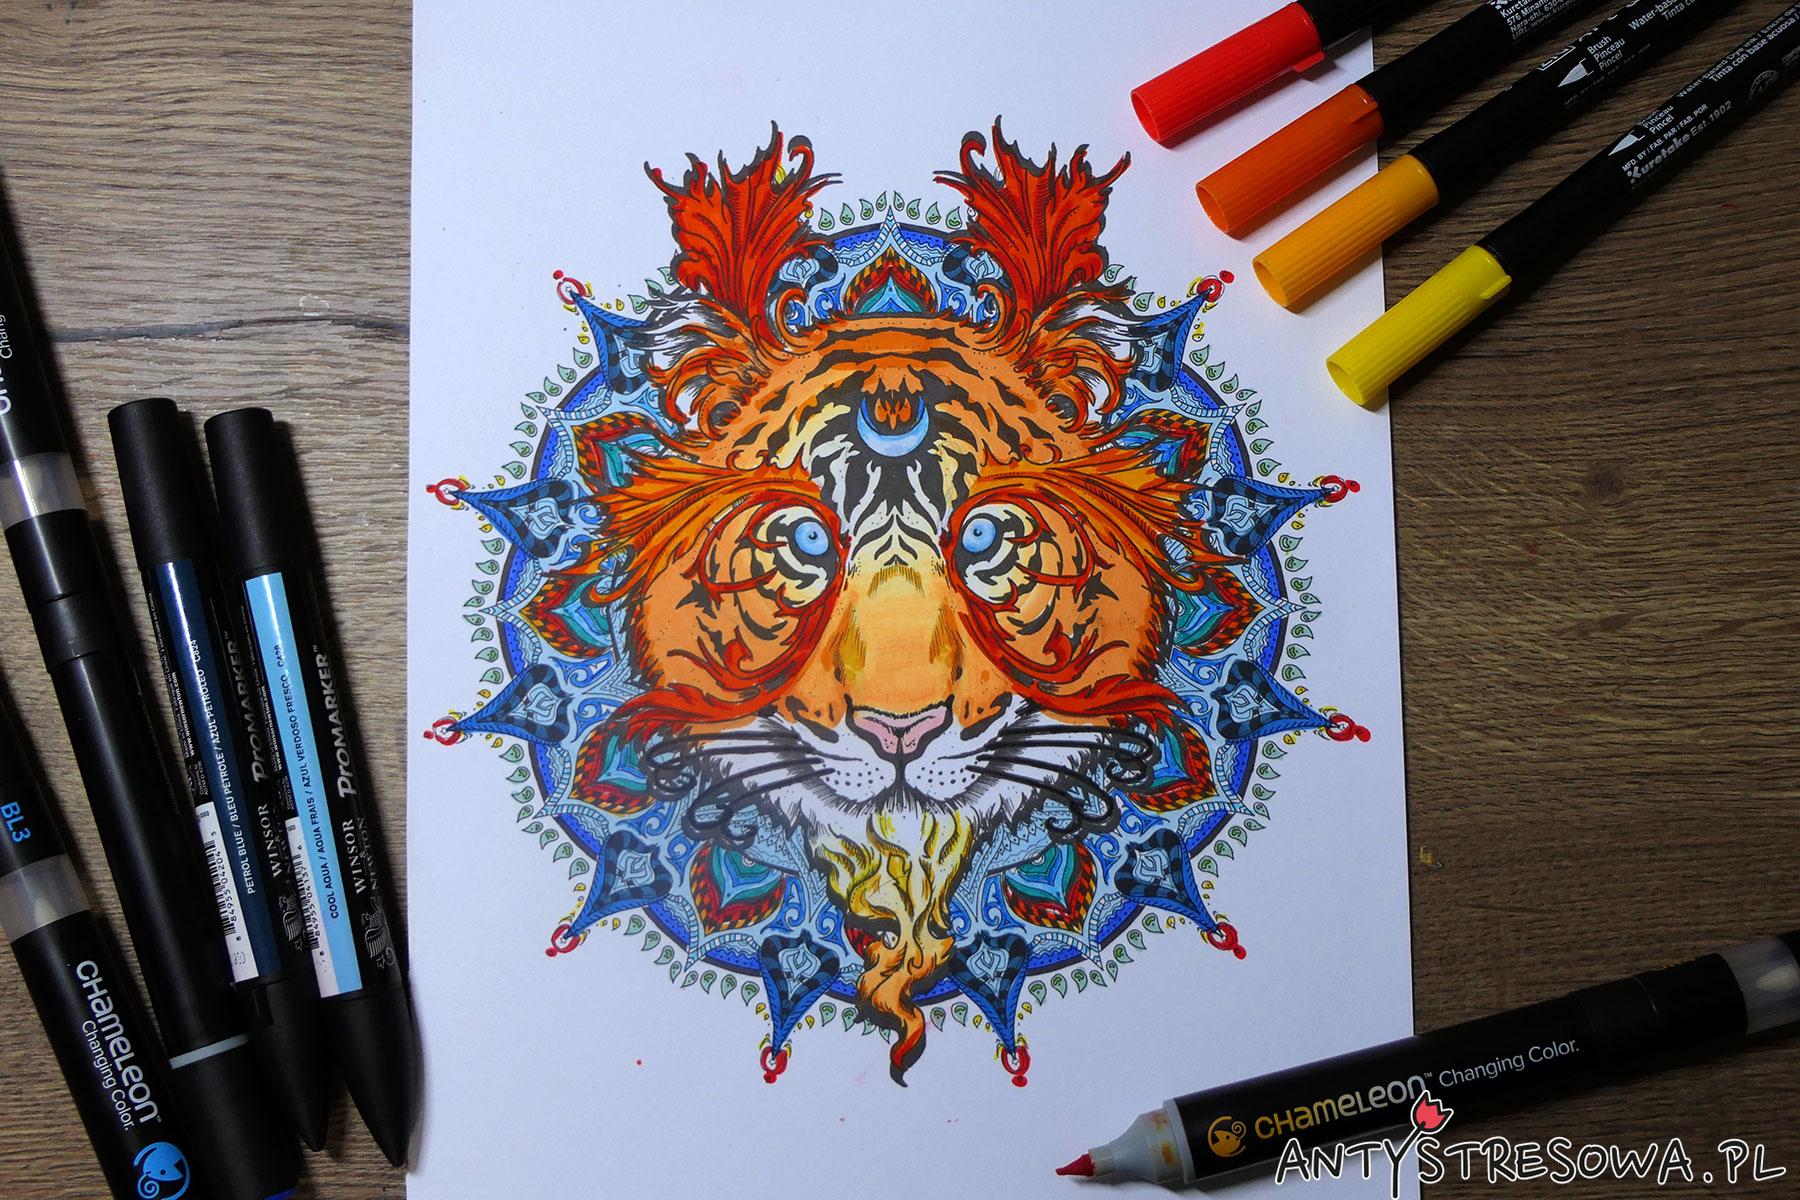 Tygrys-Mandalas Gone Wild, Dino Tomic